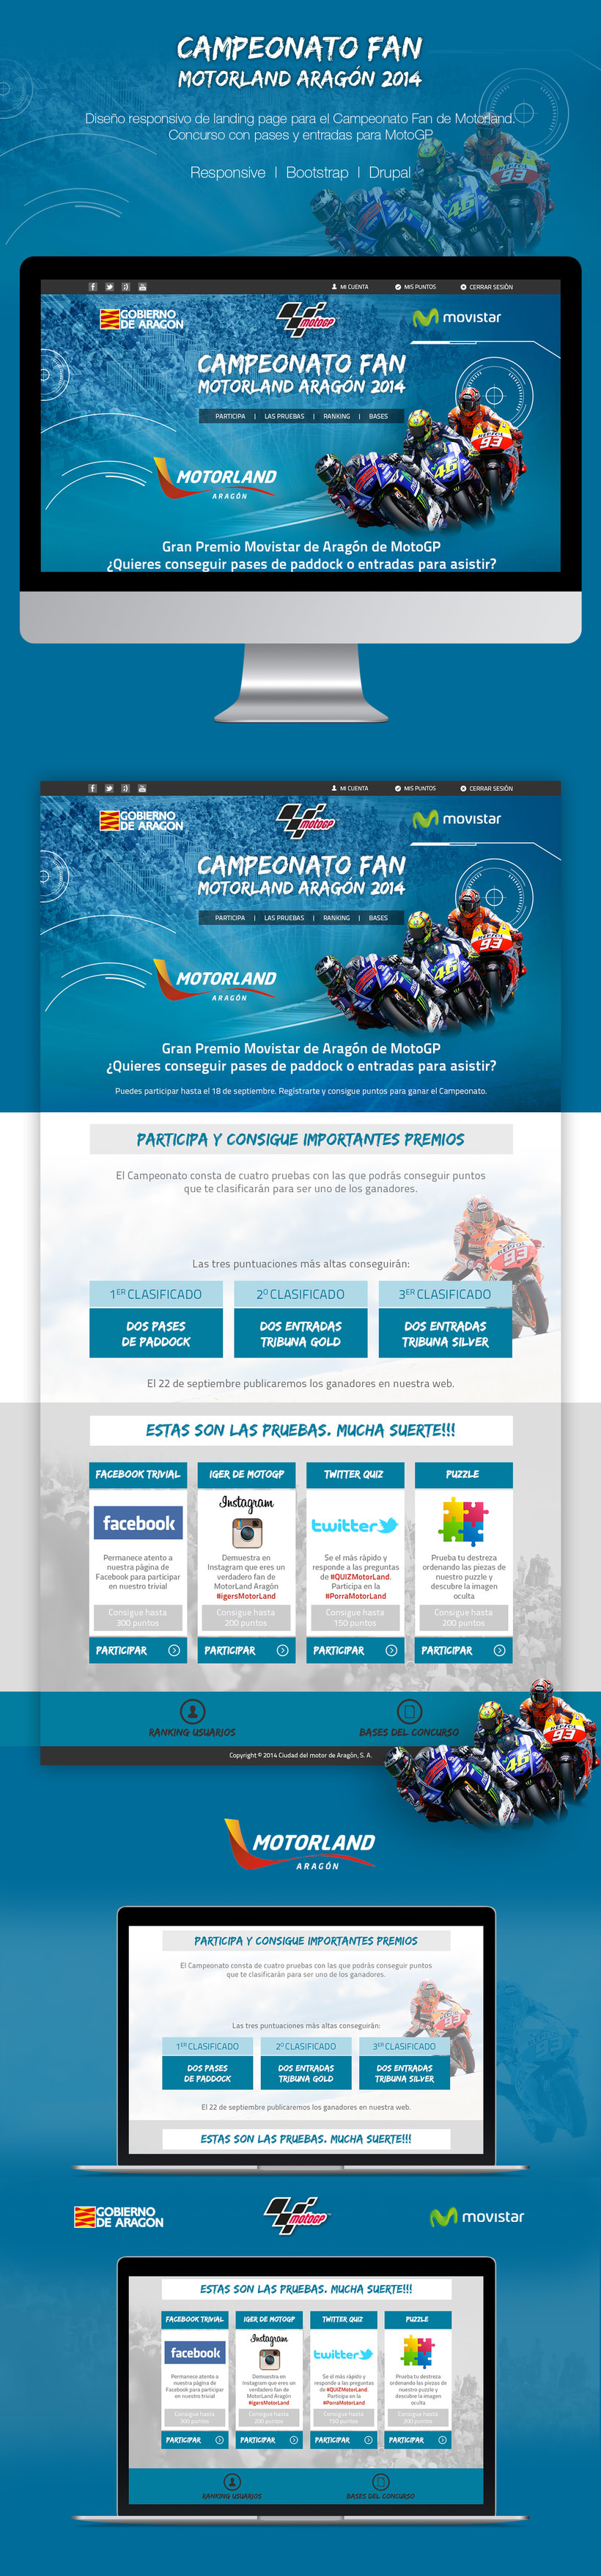 Campeonato Fan Motorland | Website -1